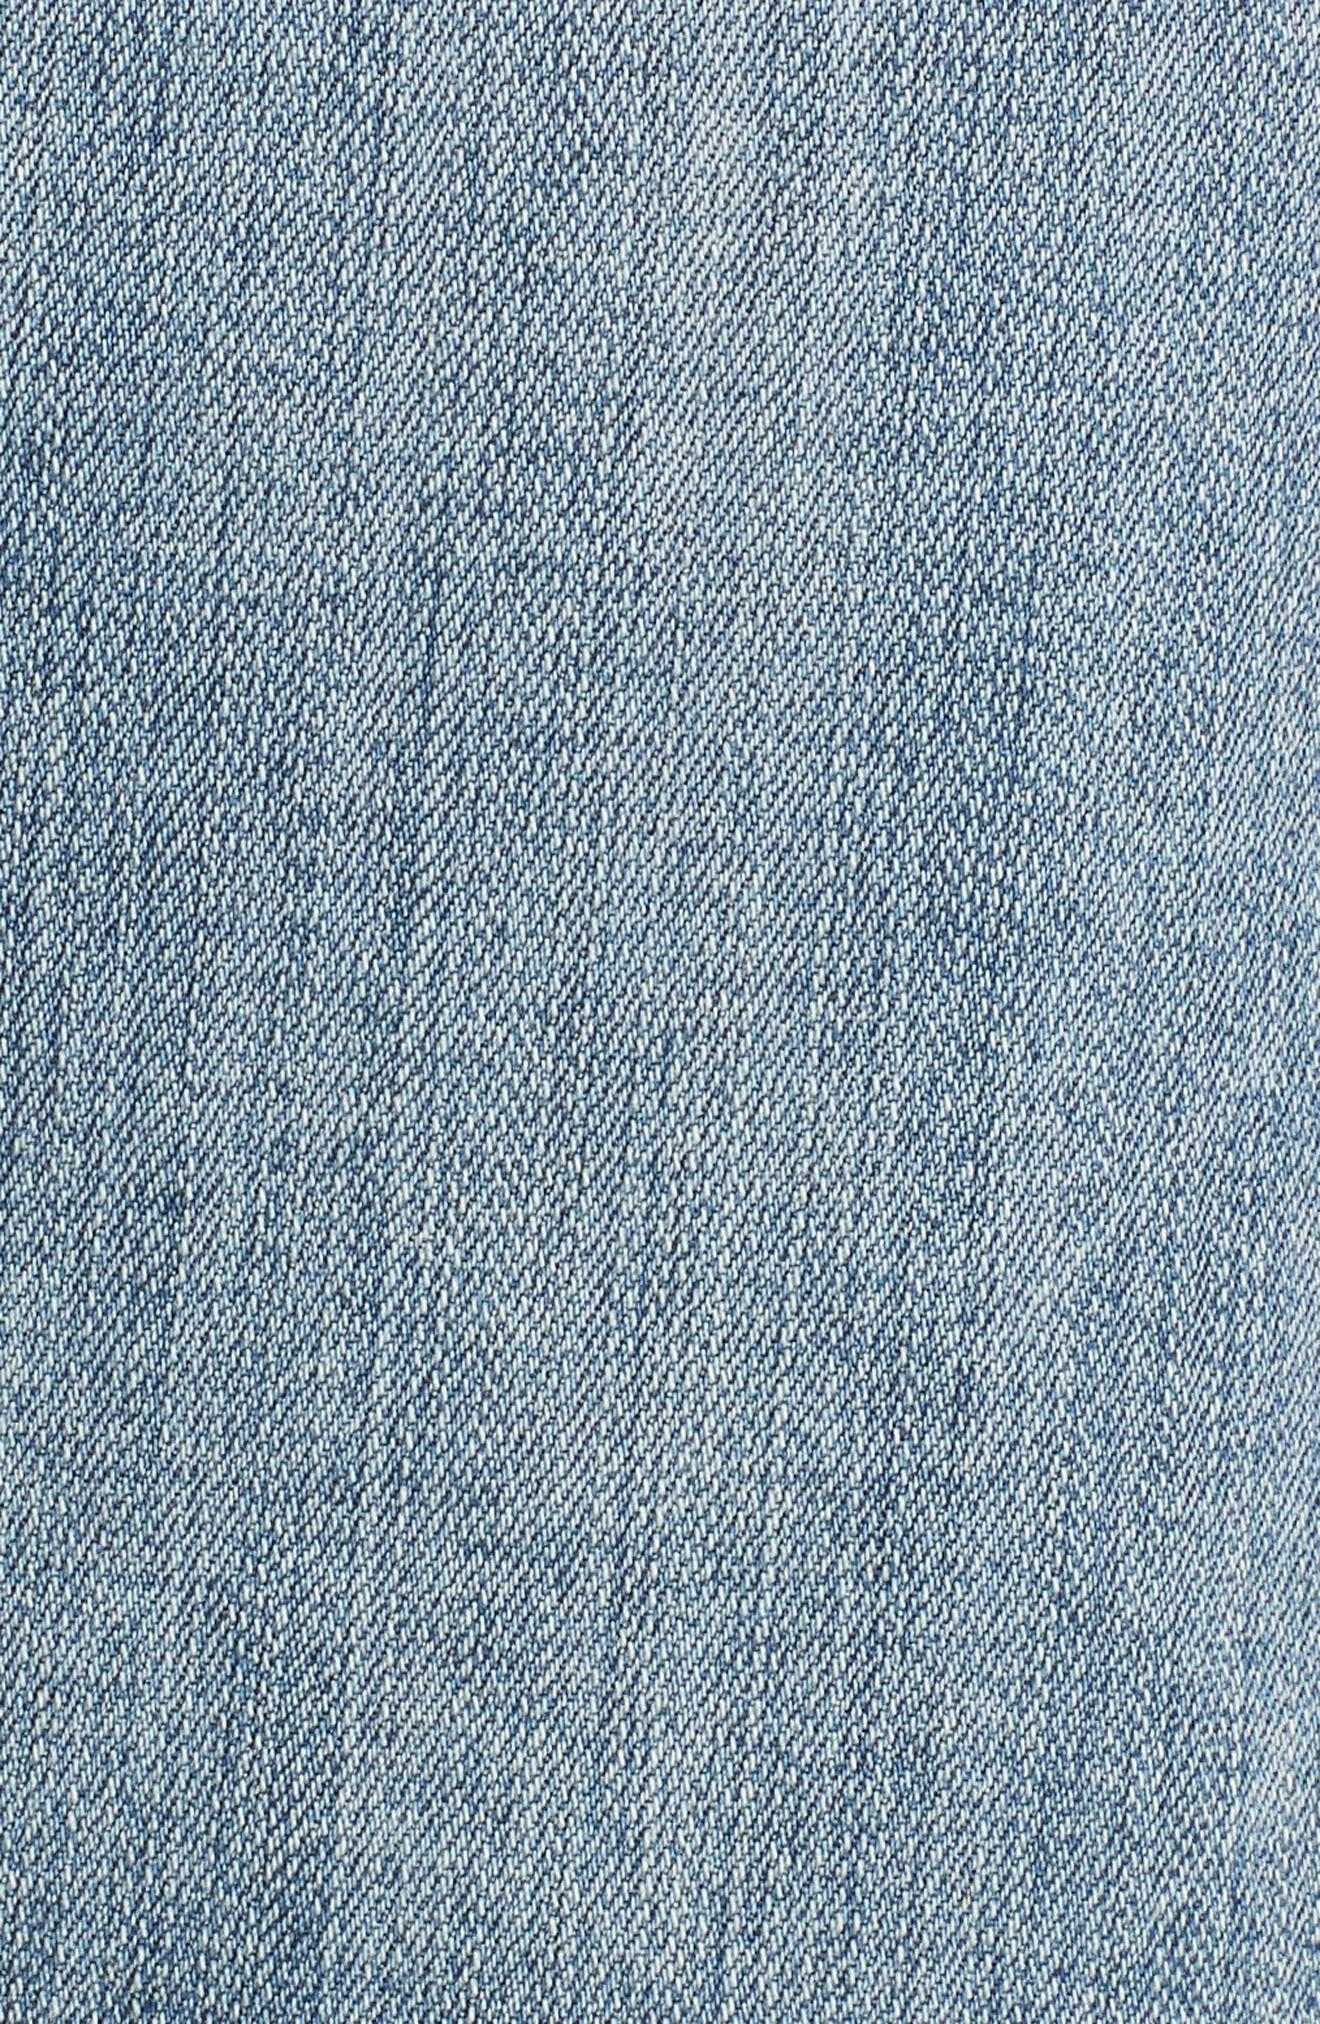 Belted Stretch Denim Skirt,                             Alternate thumbnail 5, color,                             420